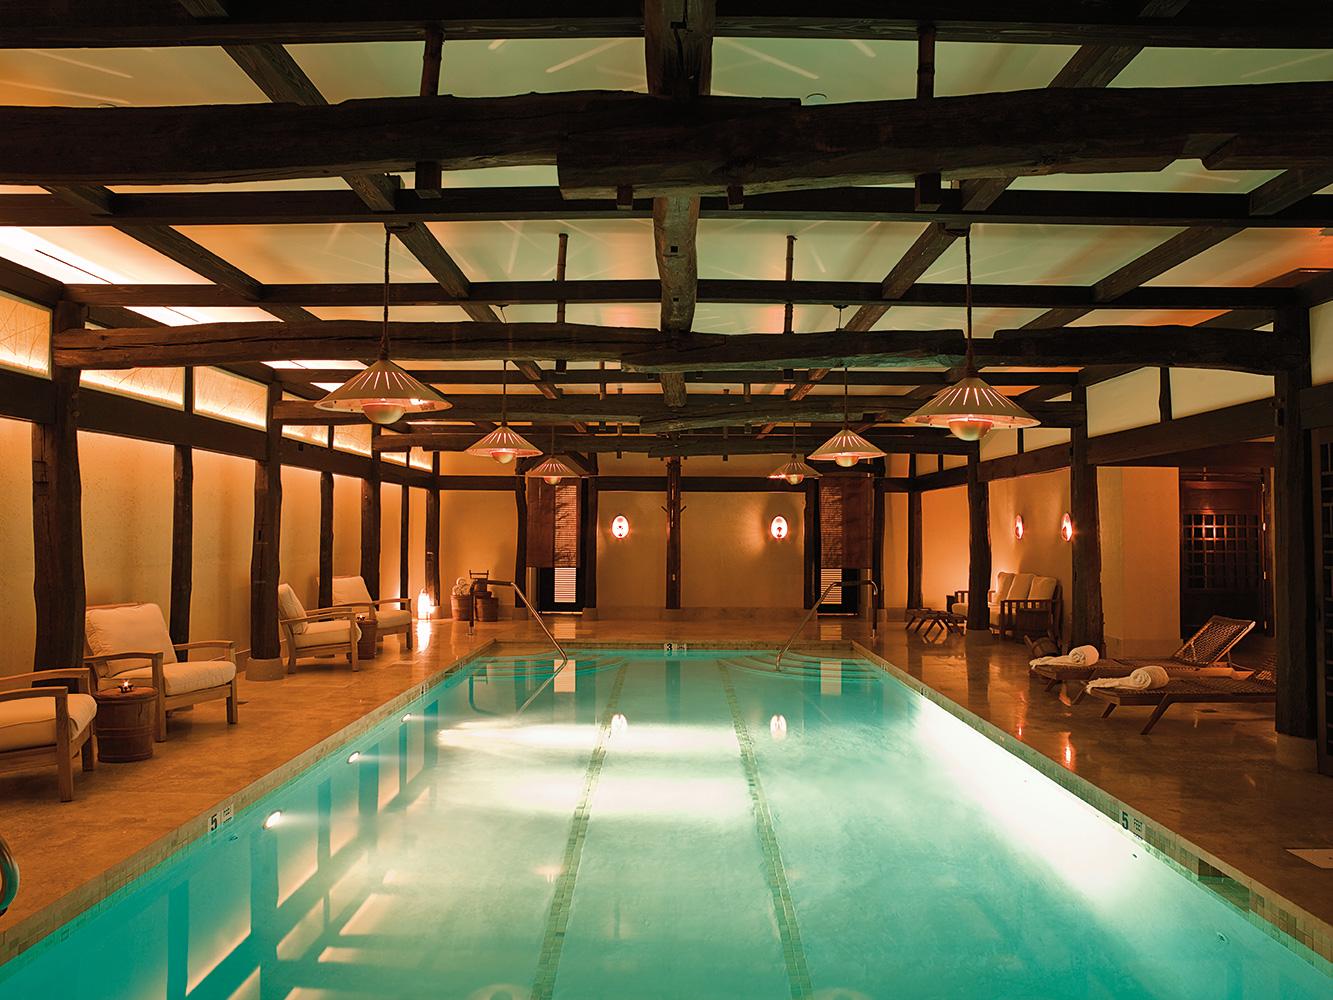 Shibui Spa pool-The Greenwich Hotel-NYC-Courtesy The Greenwich.jpg